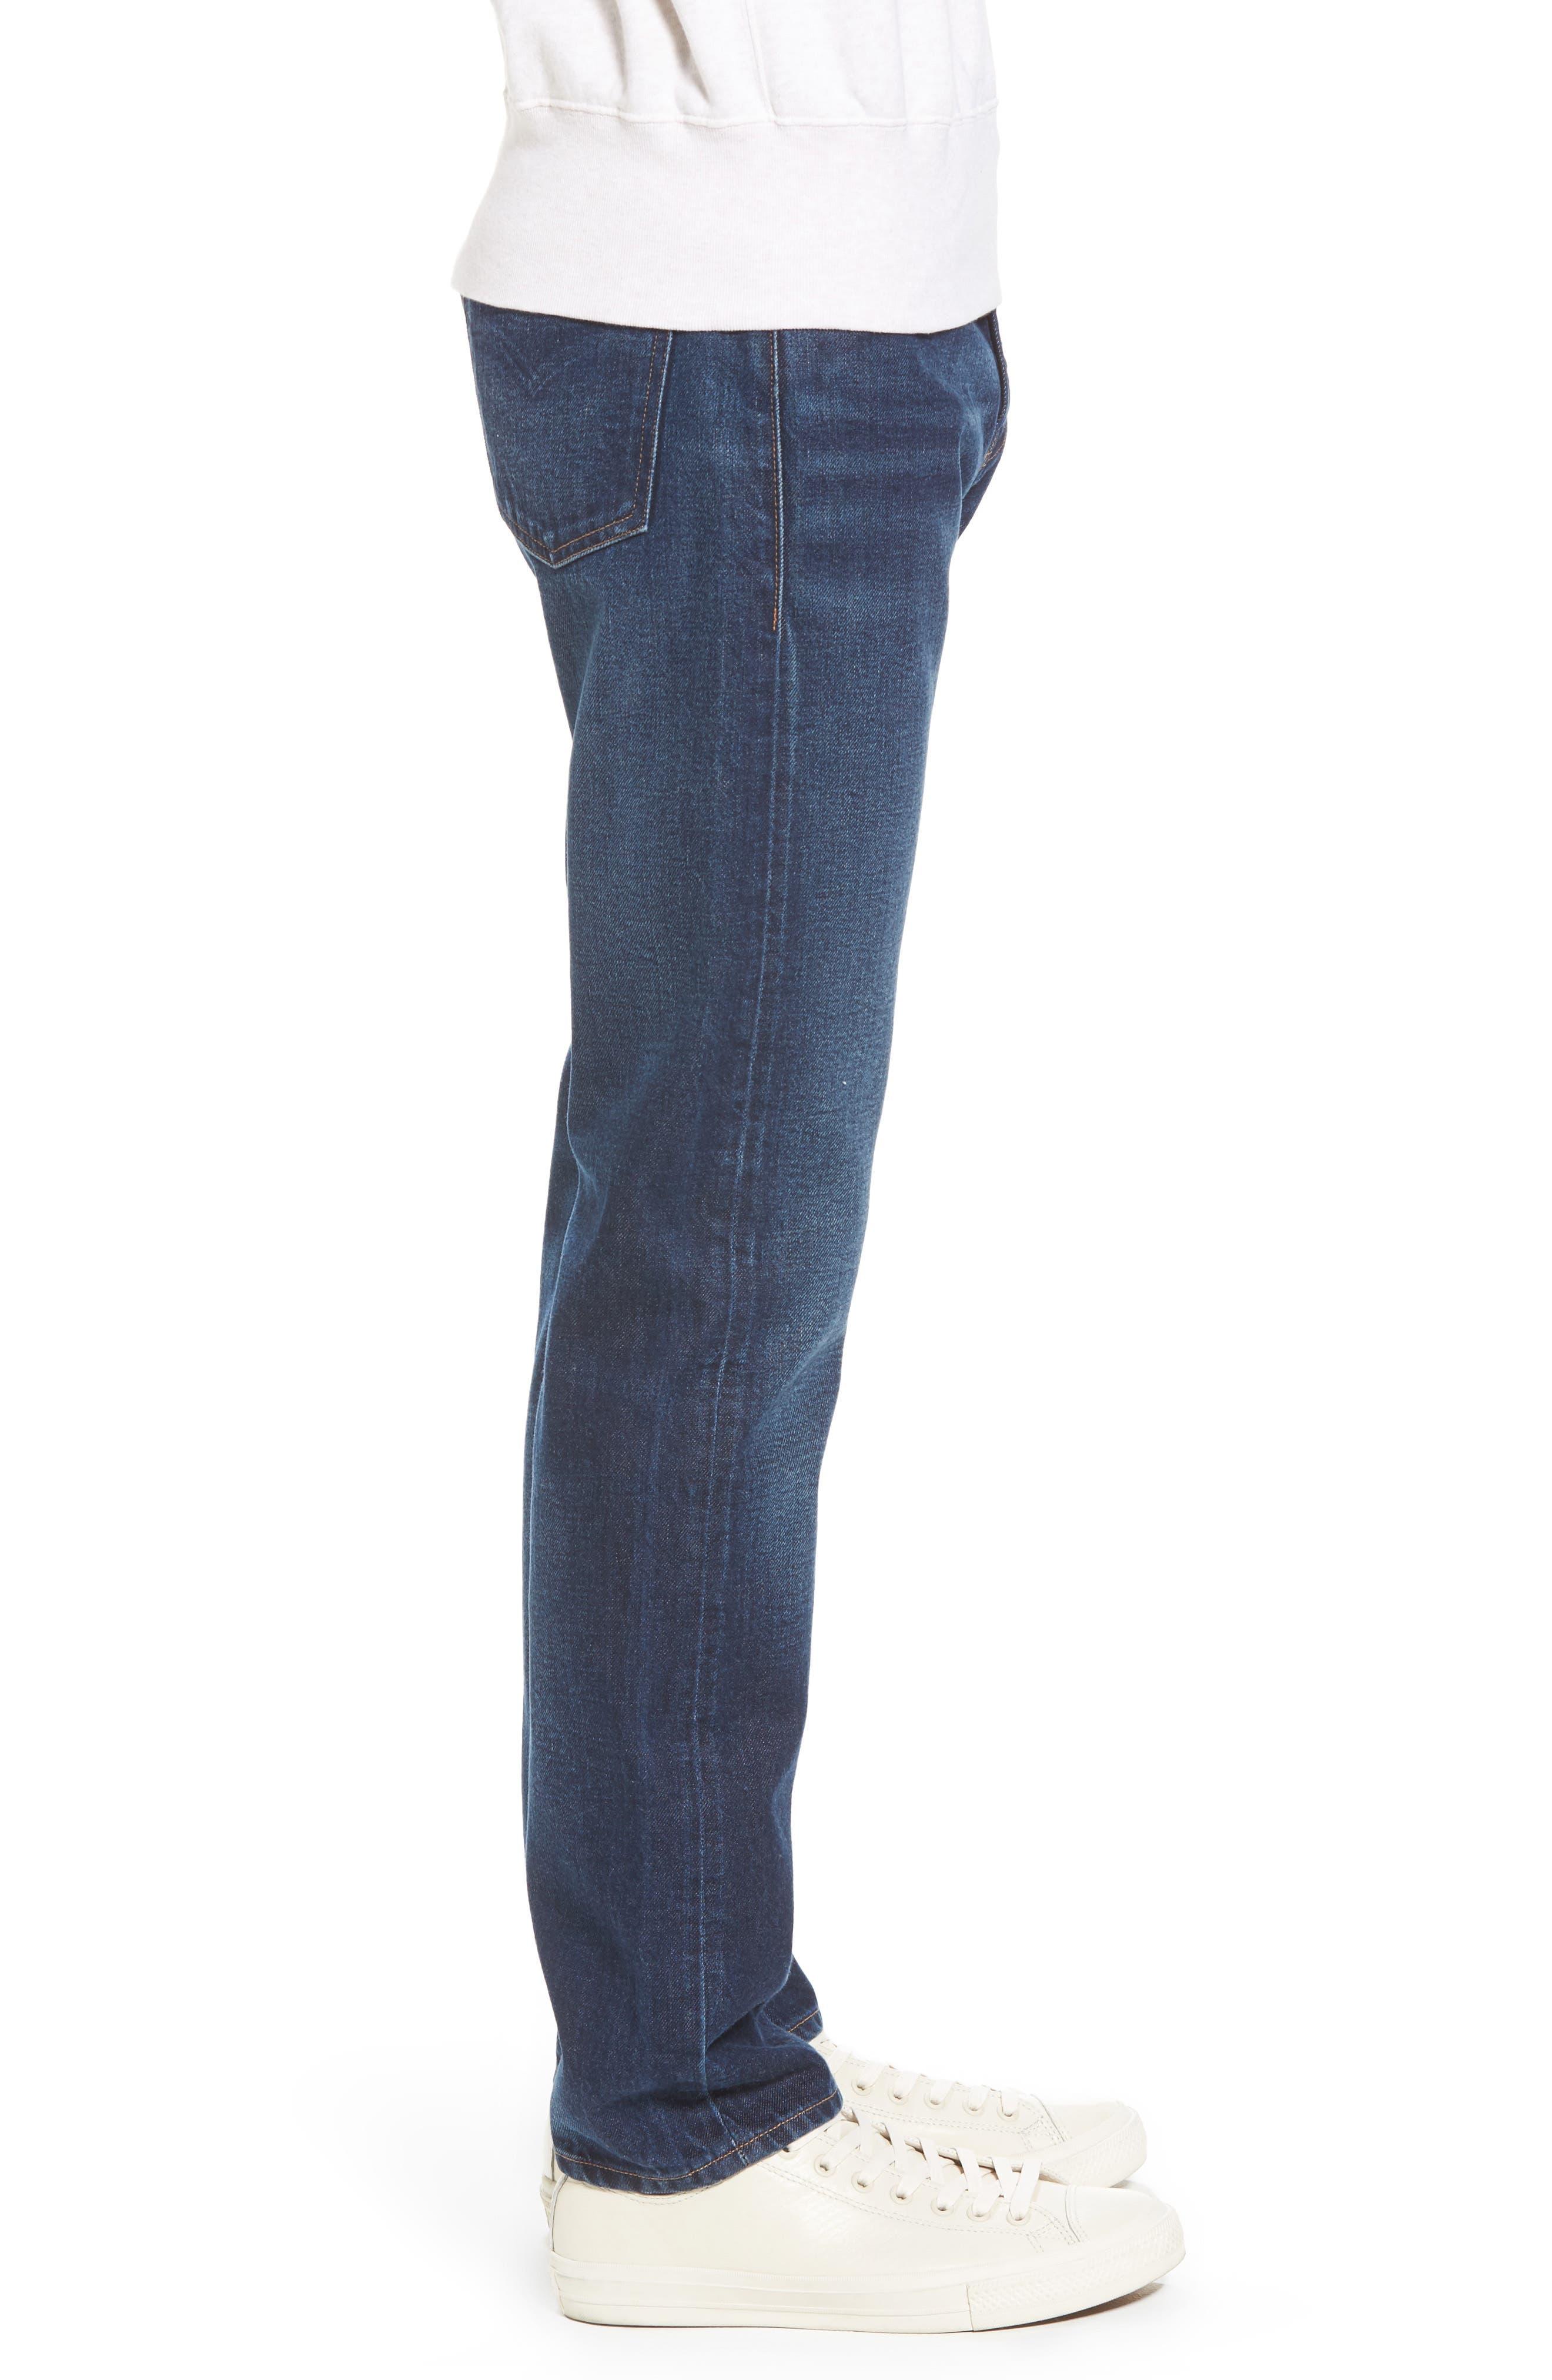 Tack Slim Fit Jeans,                             Alternate thumbnail 3, color,                             401